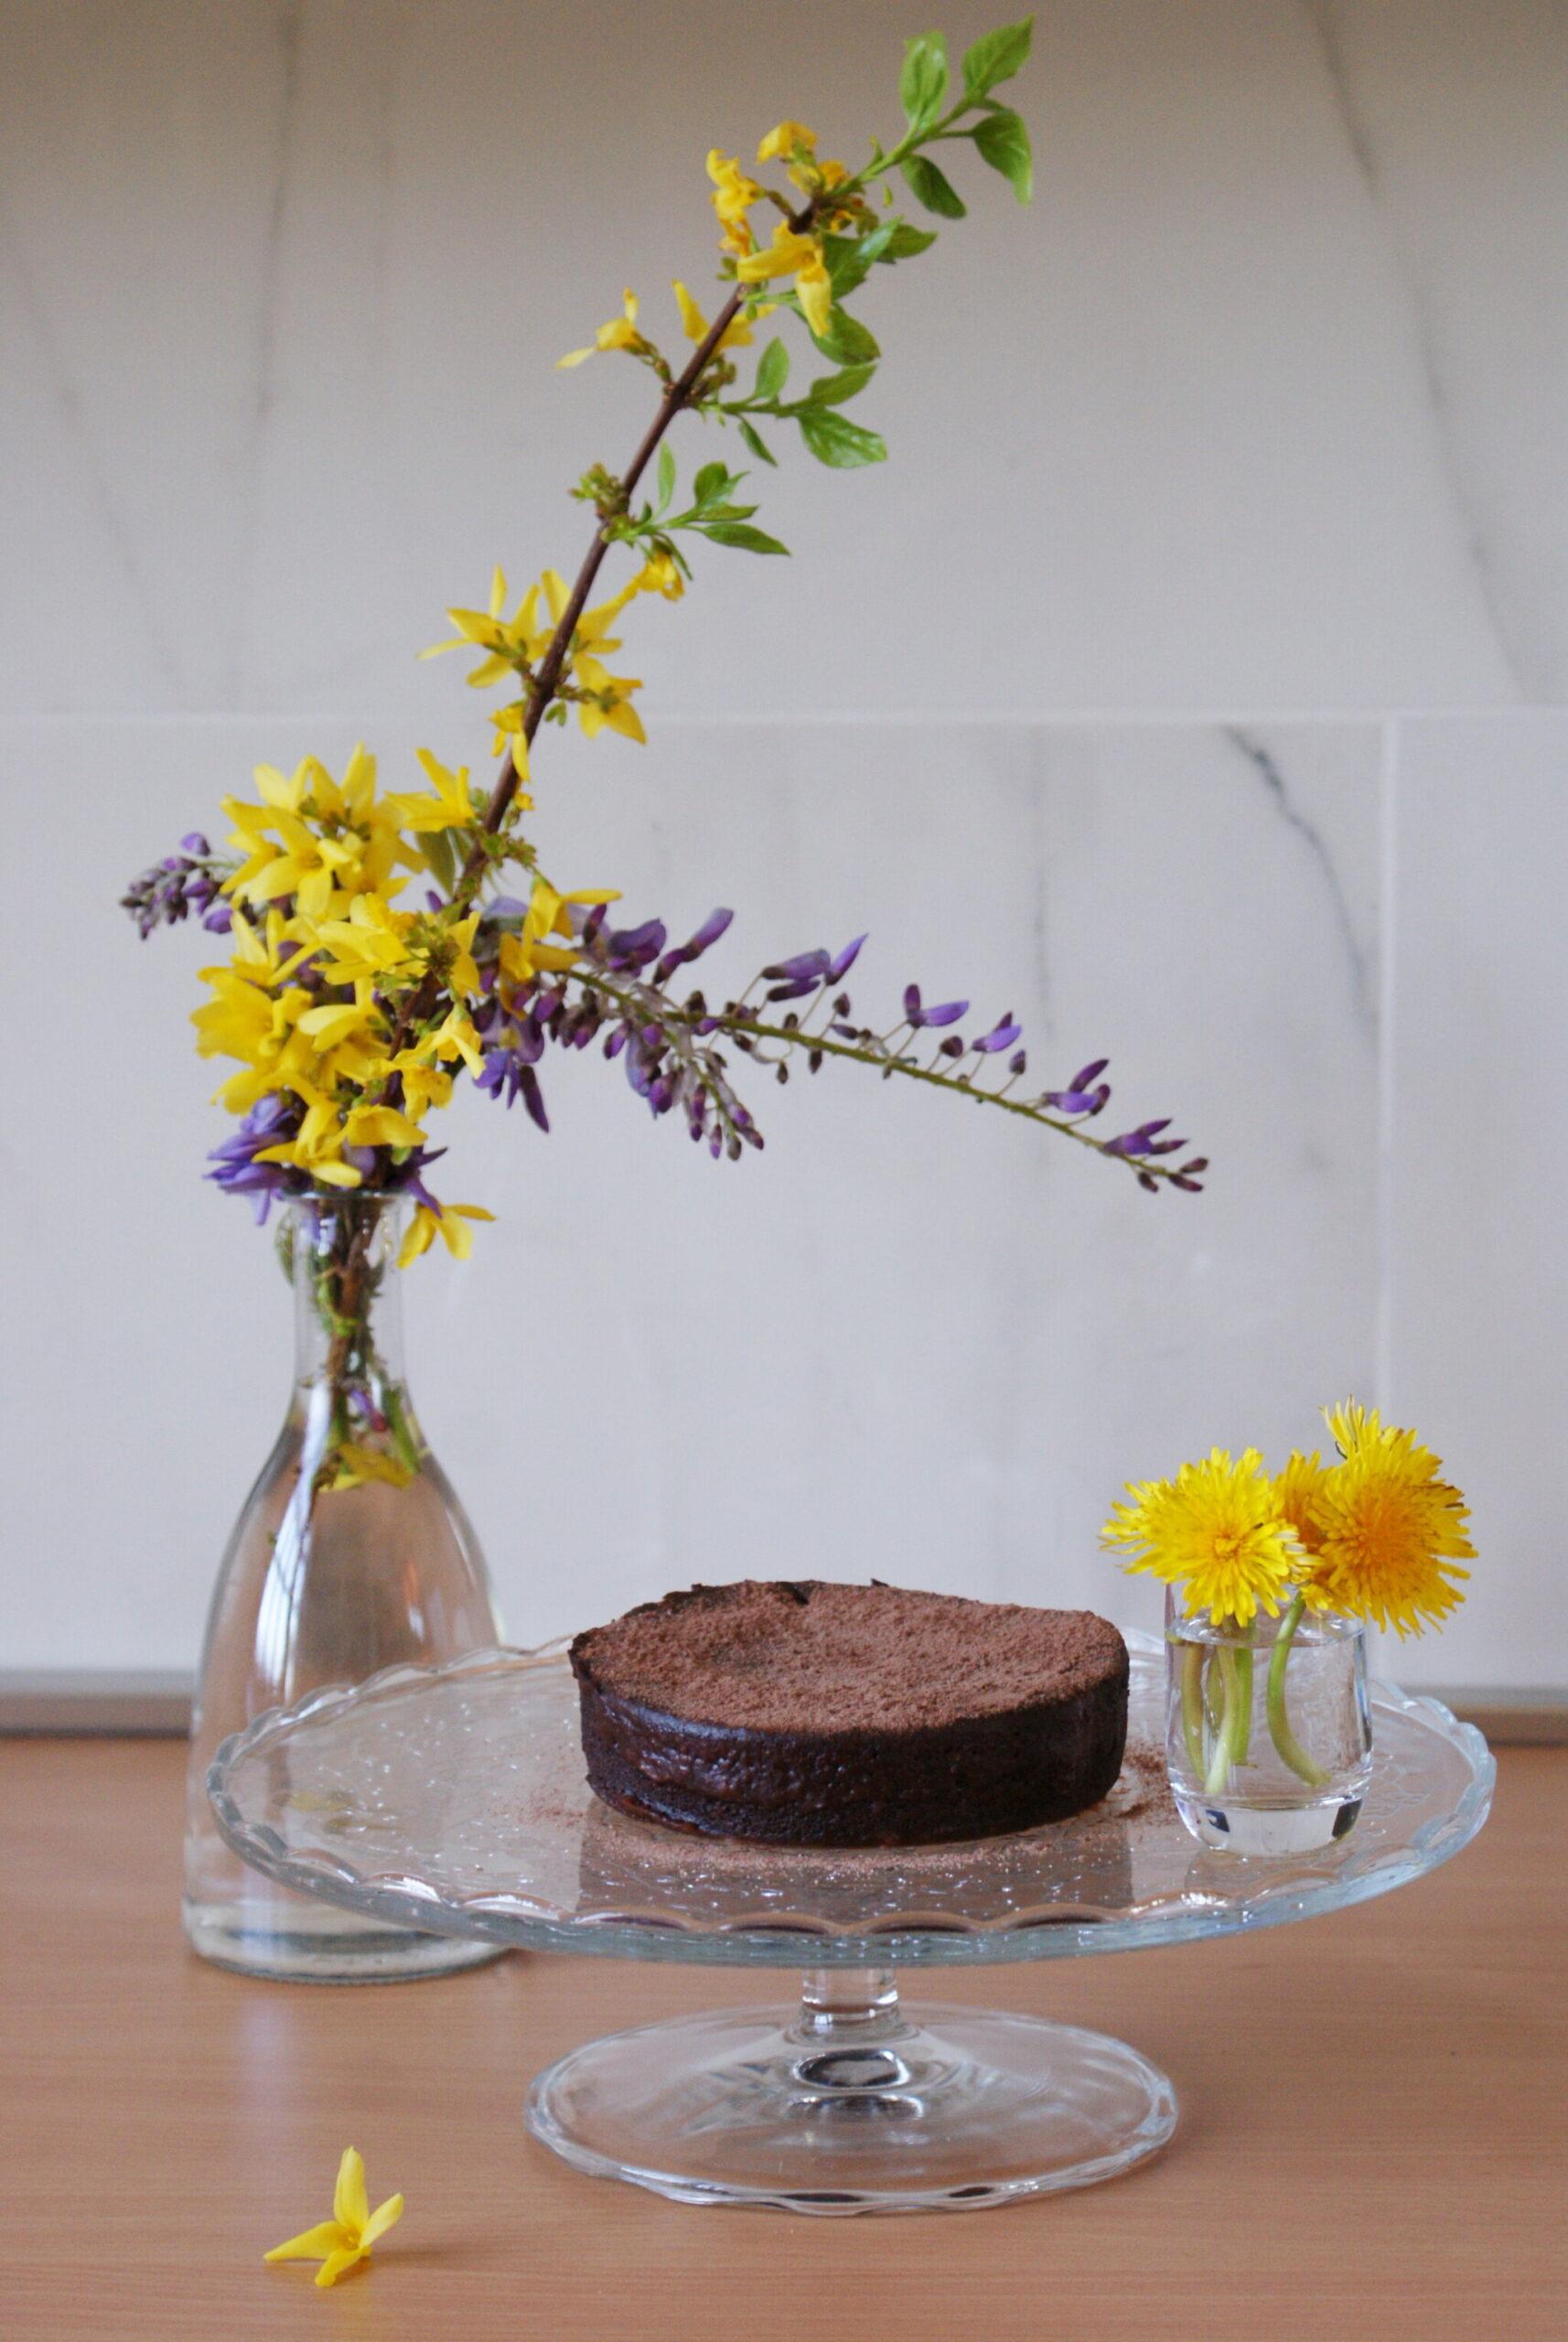 torta tortina soffice cioccolato microonde dieci 10 minuti ricetta facile veloce francinesplaceblog